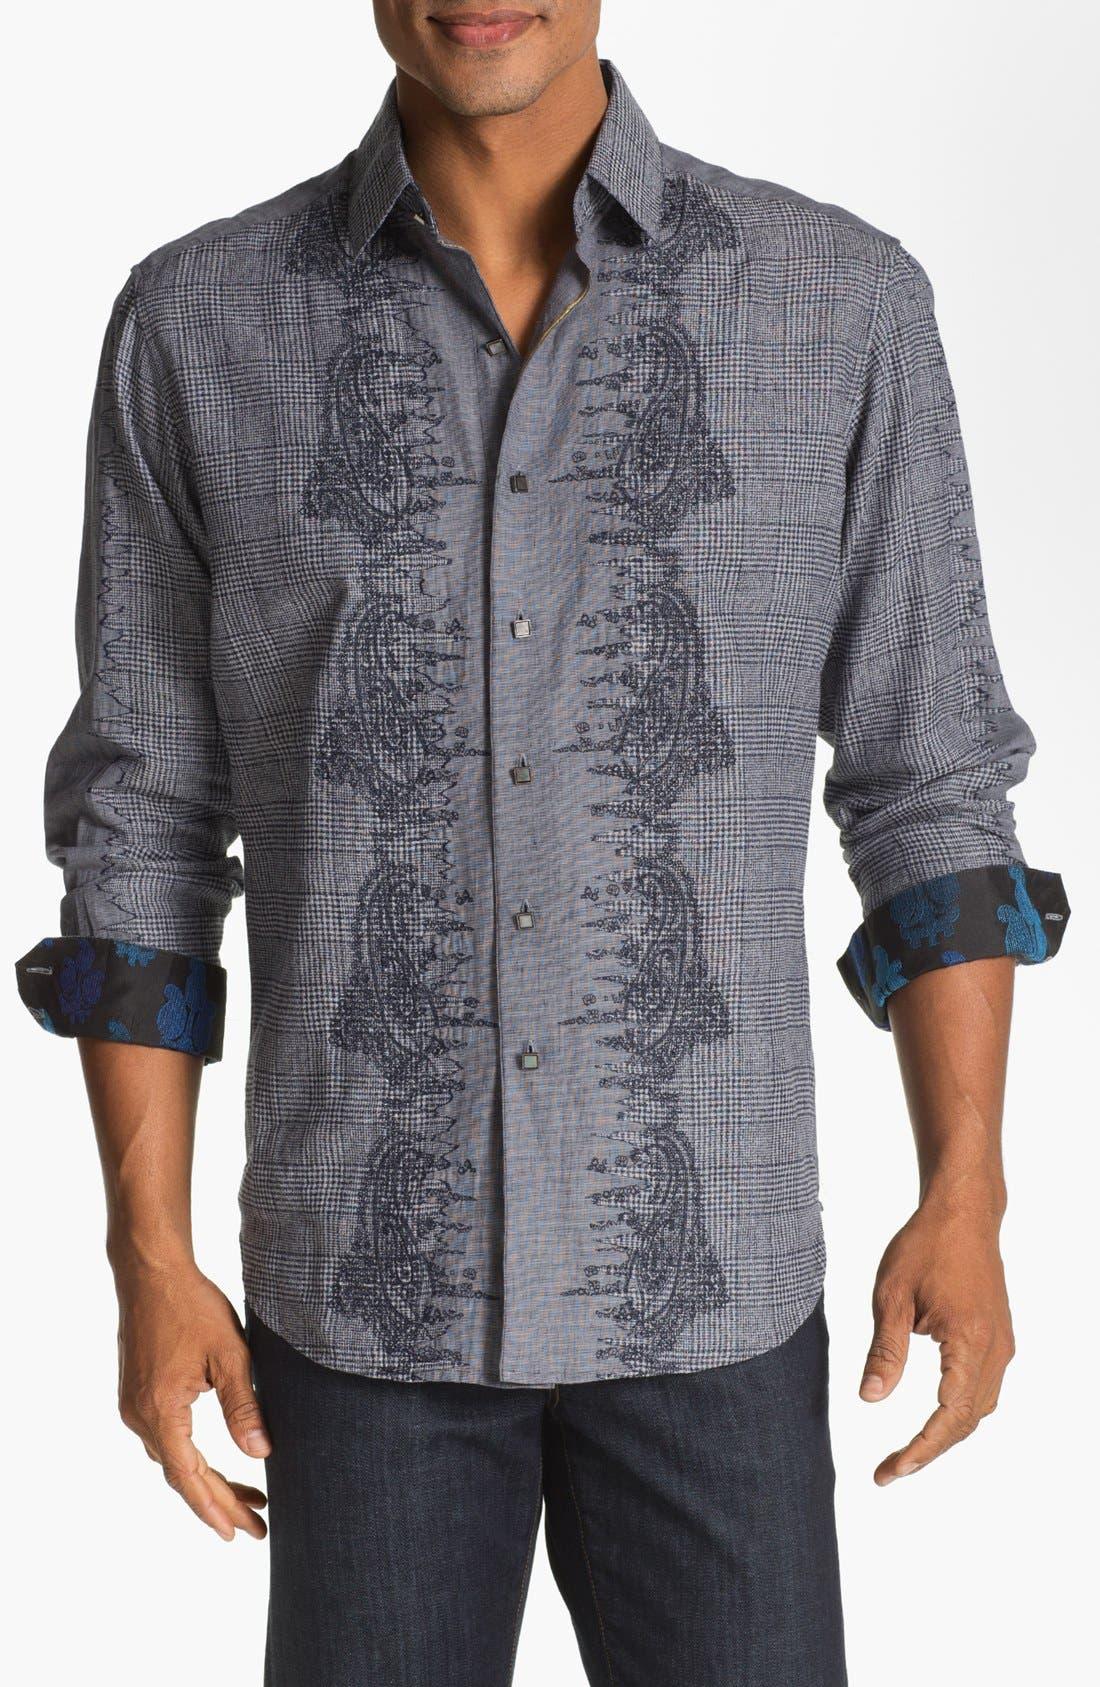 Alternate Image 1 Selected - Robert Graham 'Crowne' Regular Fit Sport Shirt (Limited Edition)